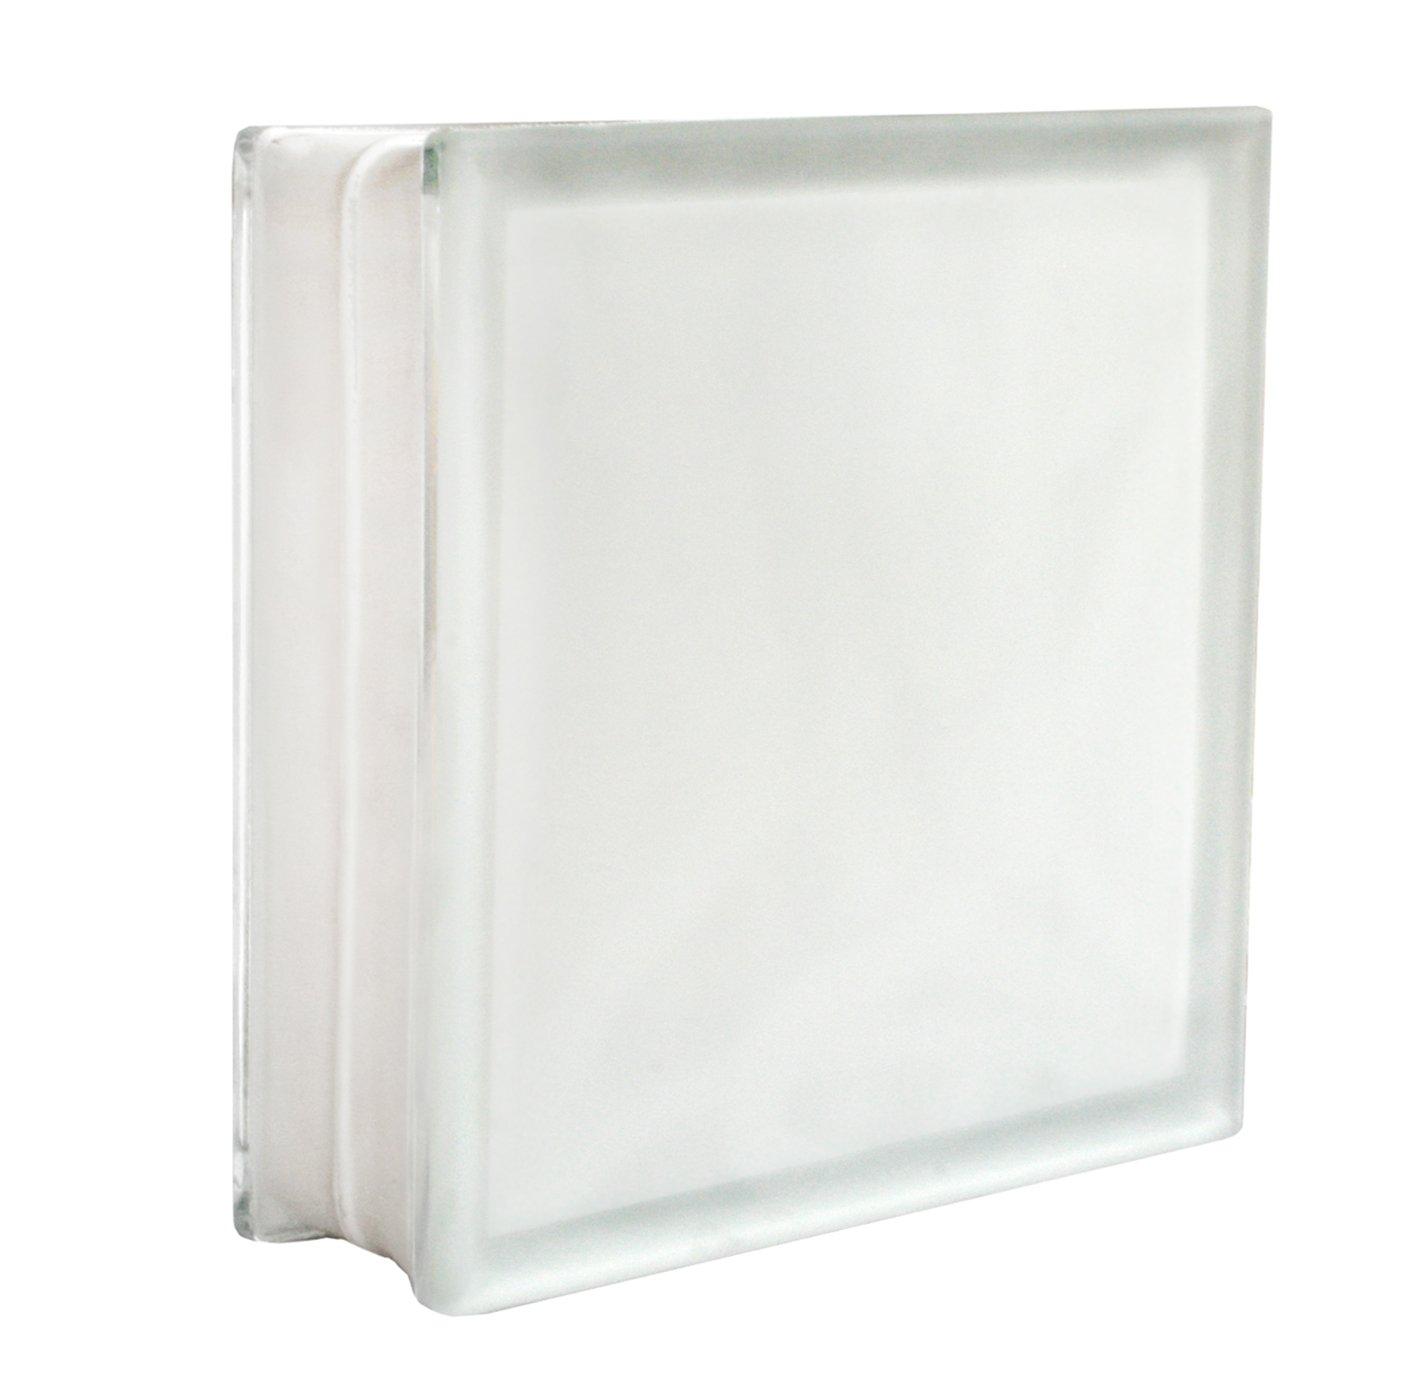 2 piezas FUCHS bloques de vidrio vista completa blanco satinado por dos lado (vidrio mate) 30x30x10 cm Fuchs Design